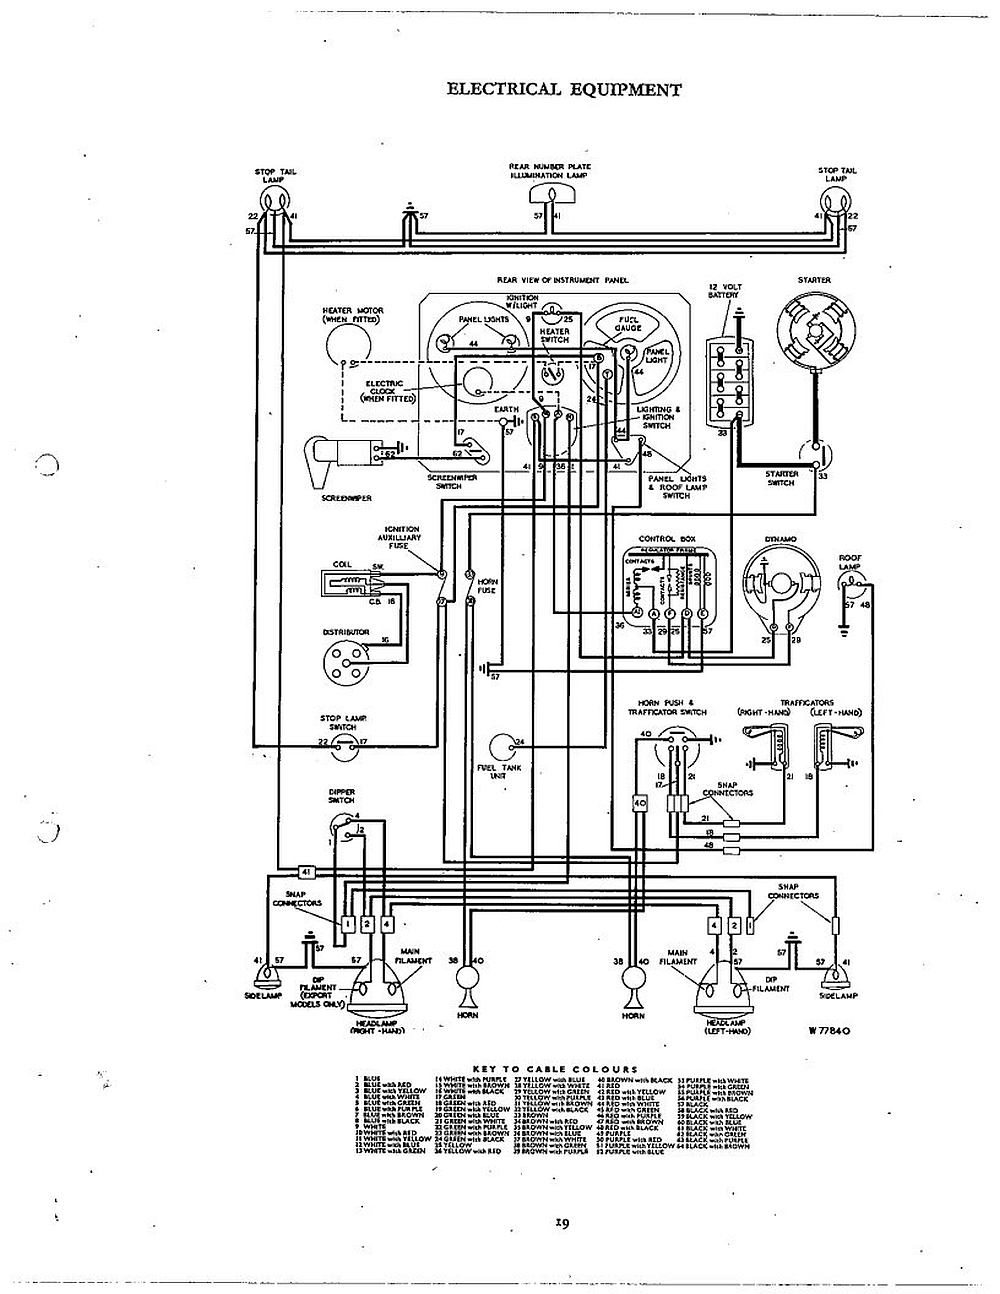 1980 Spitfire Wiring Diagram Another Blog About Acuracl20002003seatwiringschematicdiagramjpg 1974 Tr6 Schematics Rh Mychampagnedaze Com